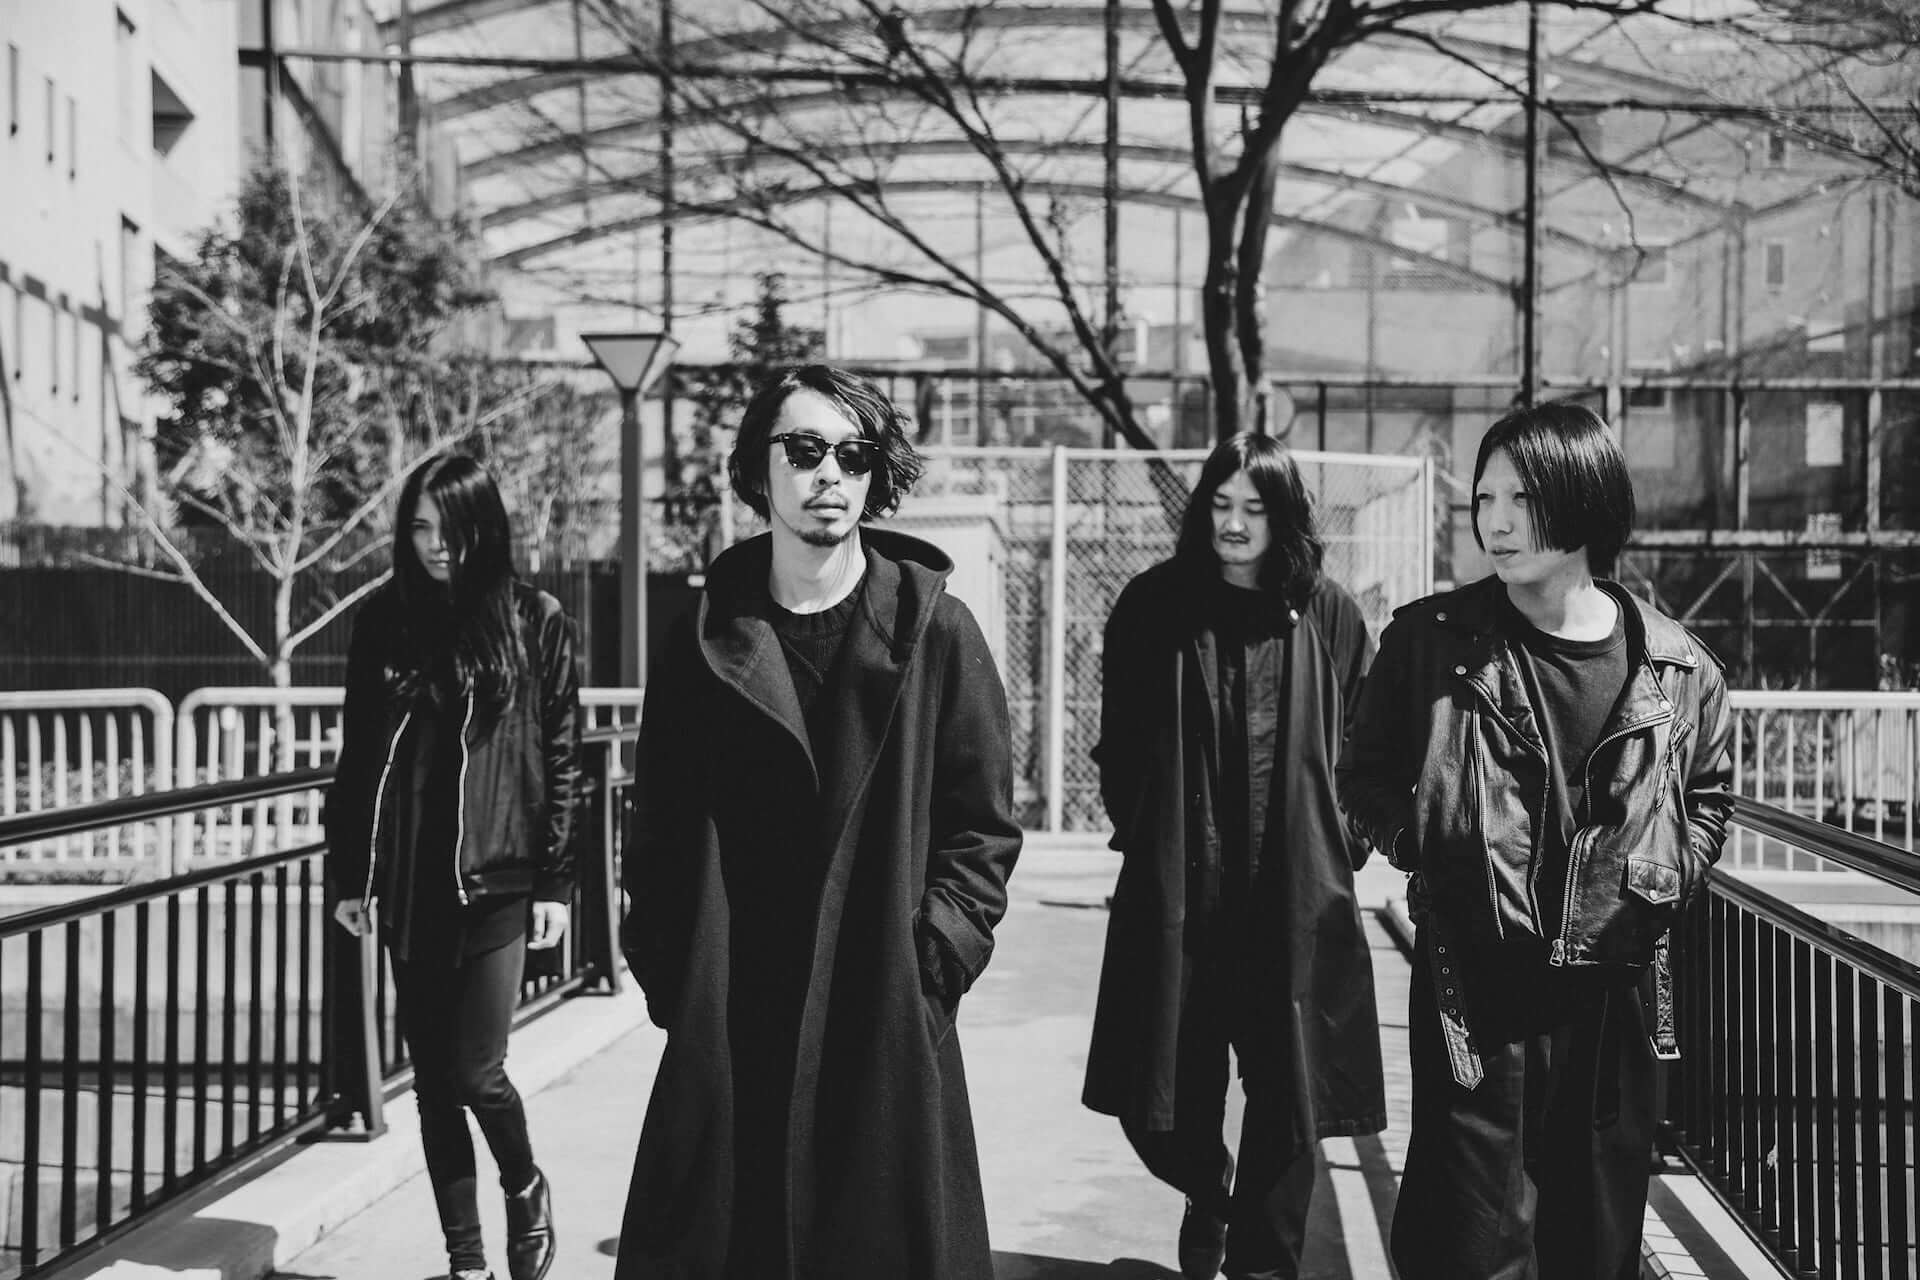 THE NOVEMBERSが最新アルバム『ANGELS』を通して語る、今の姿 interview-the-novembers-13-1-1920x1280